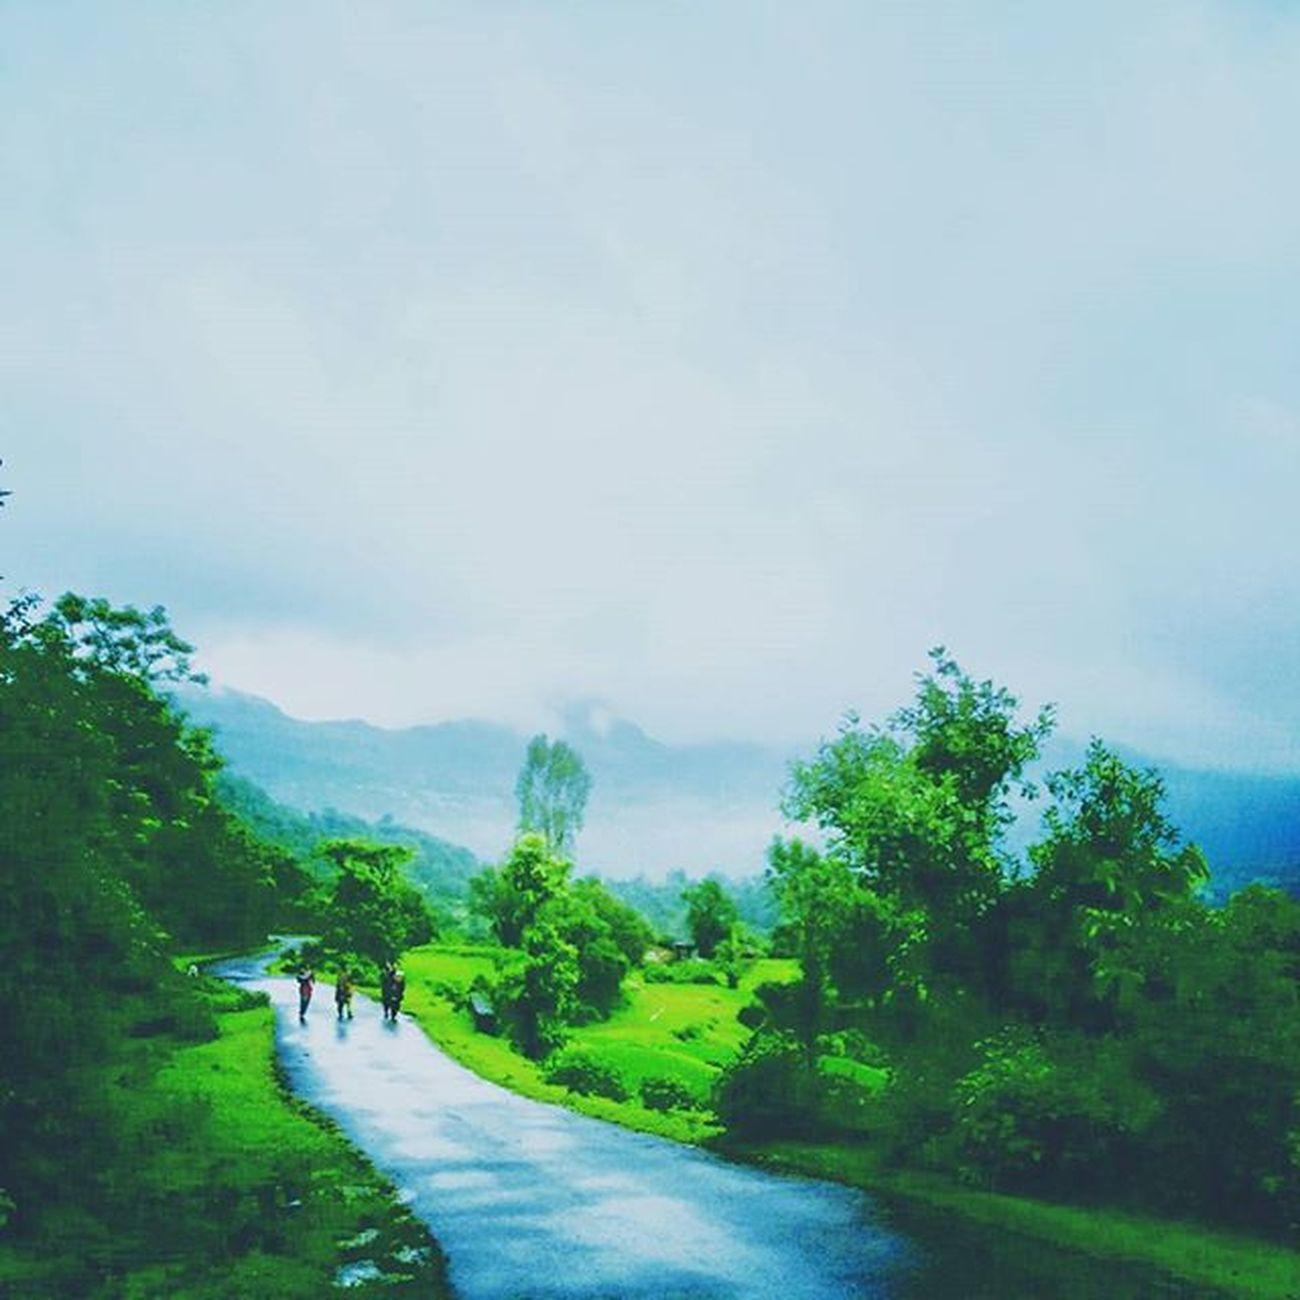 Look like painting more than click... Nature Naturelovers Natureclicks Rain RainyDay Amazing Colors Awesome Fog Foggy India Maharashtra Pune Photooftheday Picoftheday Perfectnature Dm Camera Greenery Wild Wildlife Travel Weather Instagram